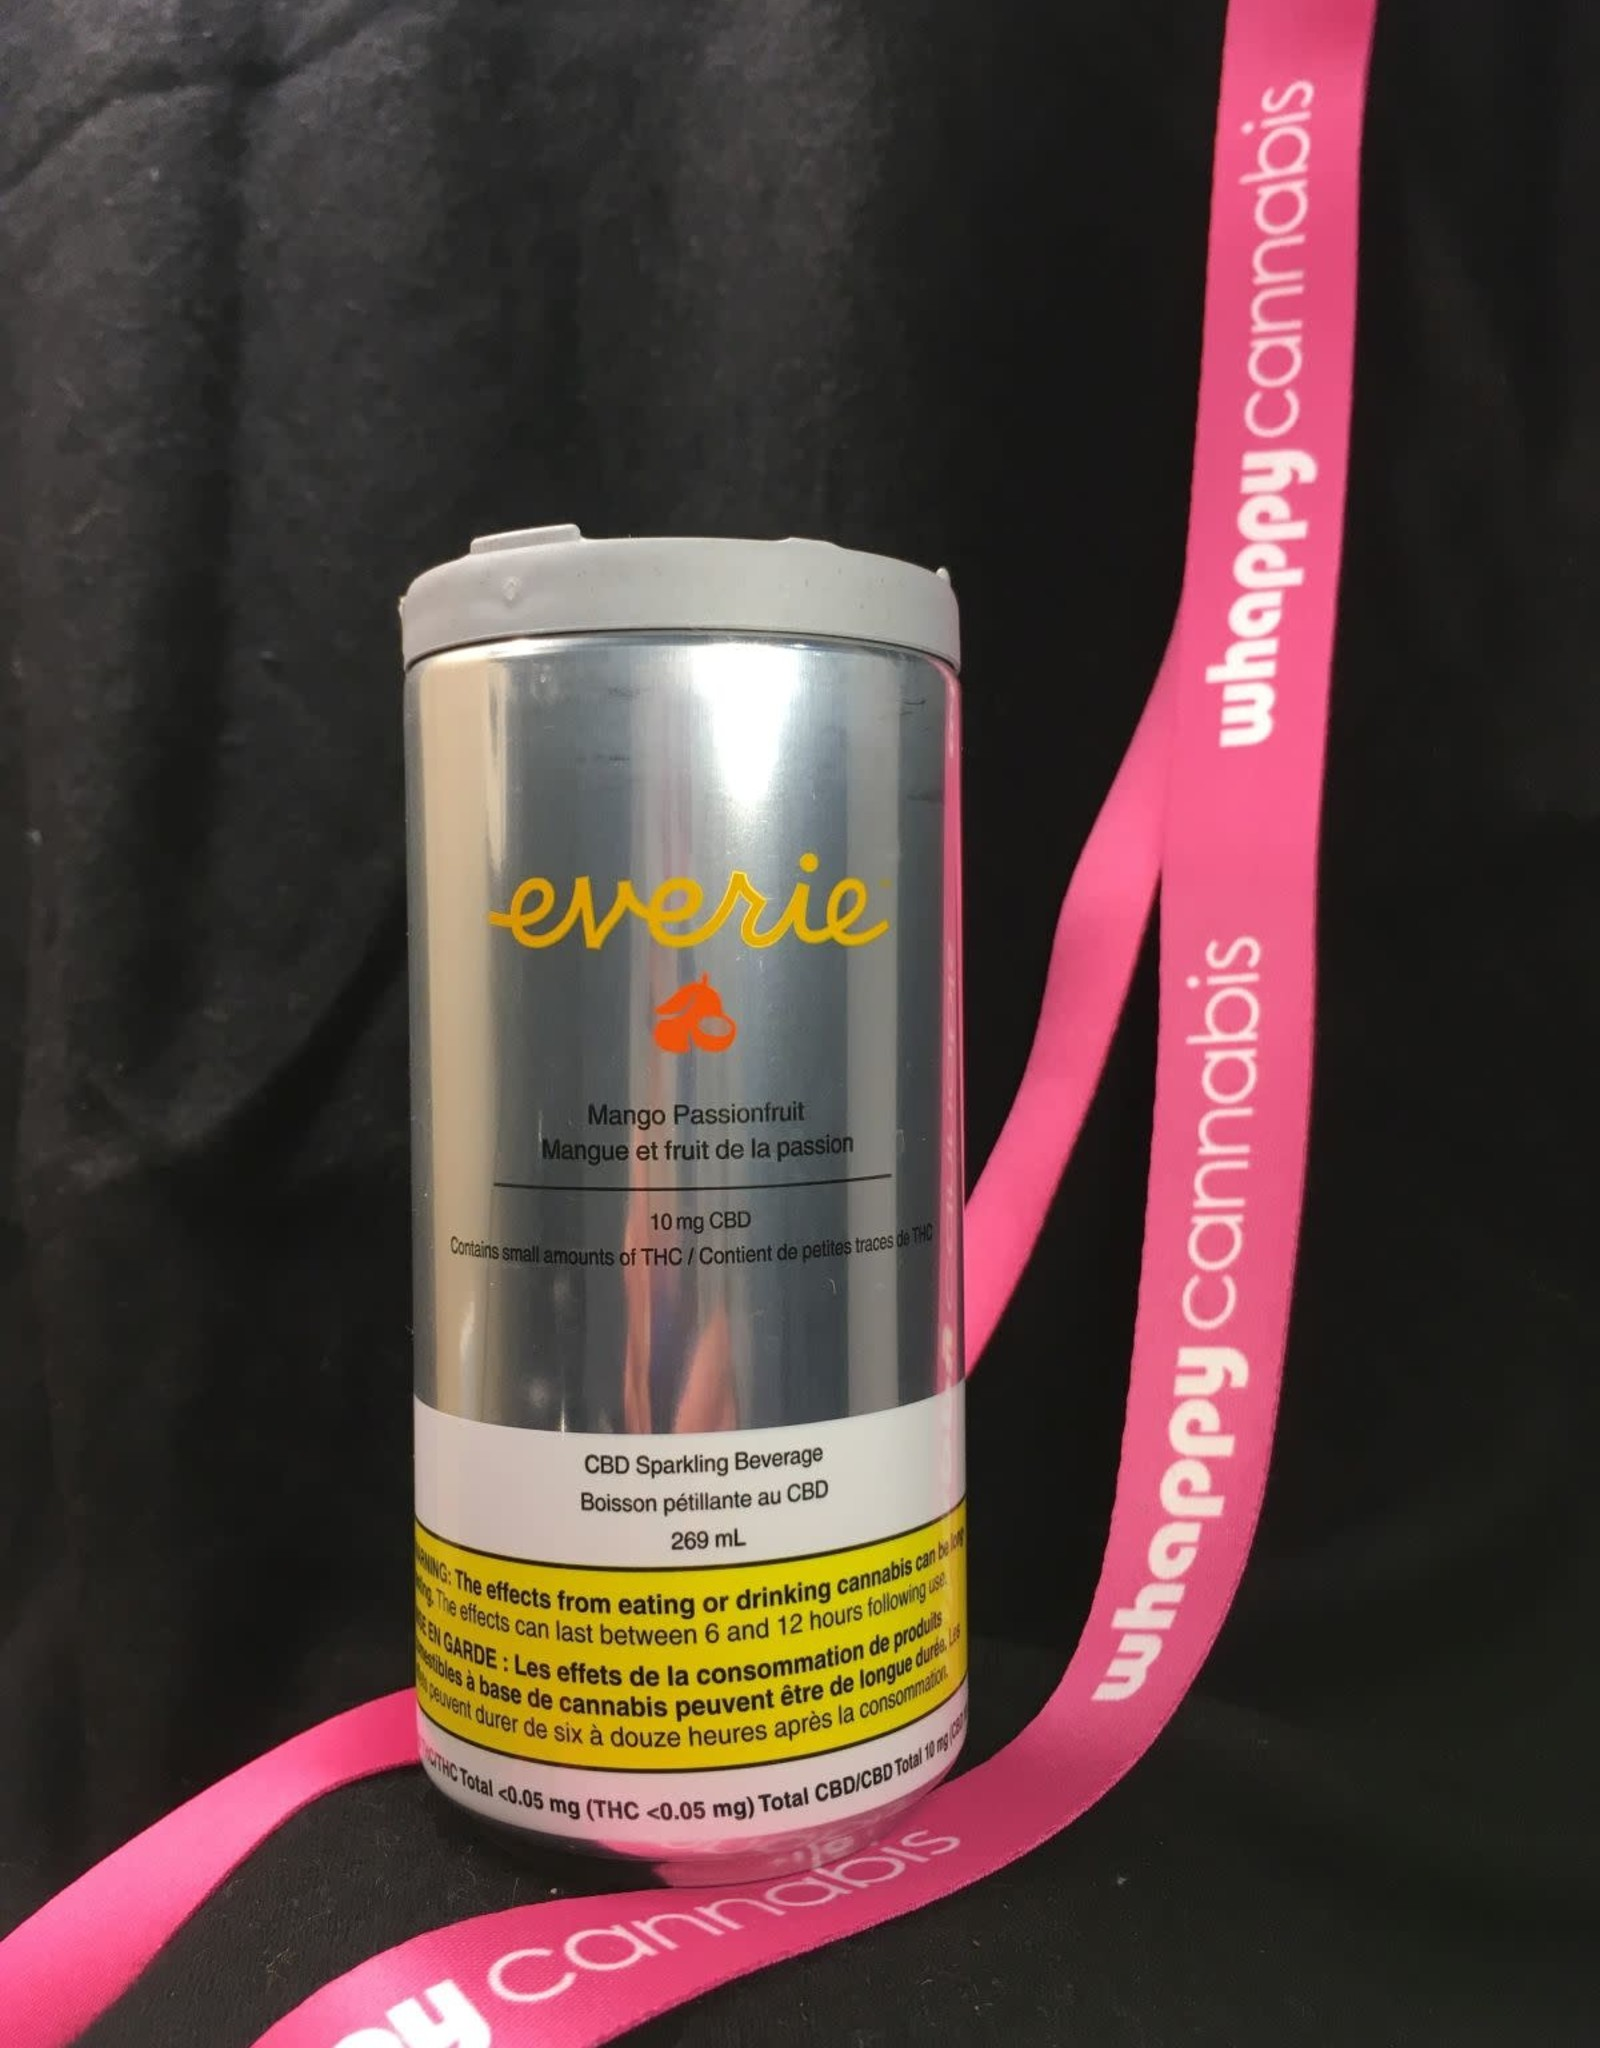 Everie Everie - CBD Mango Passionfruit Sparkling Water Blend 269ml